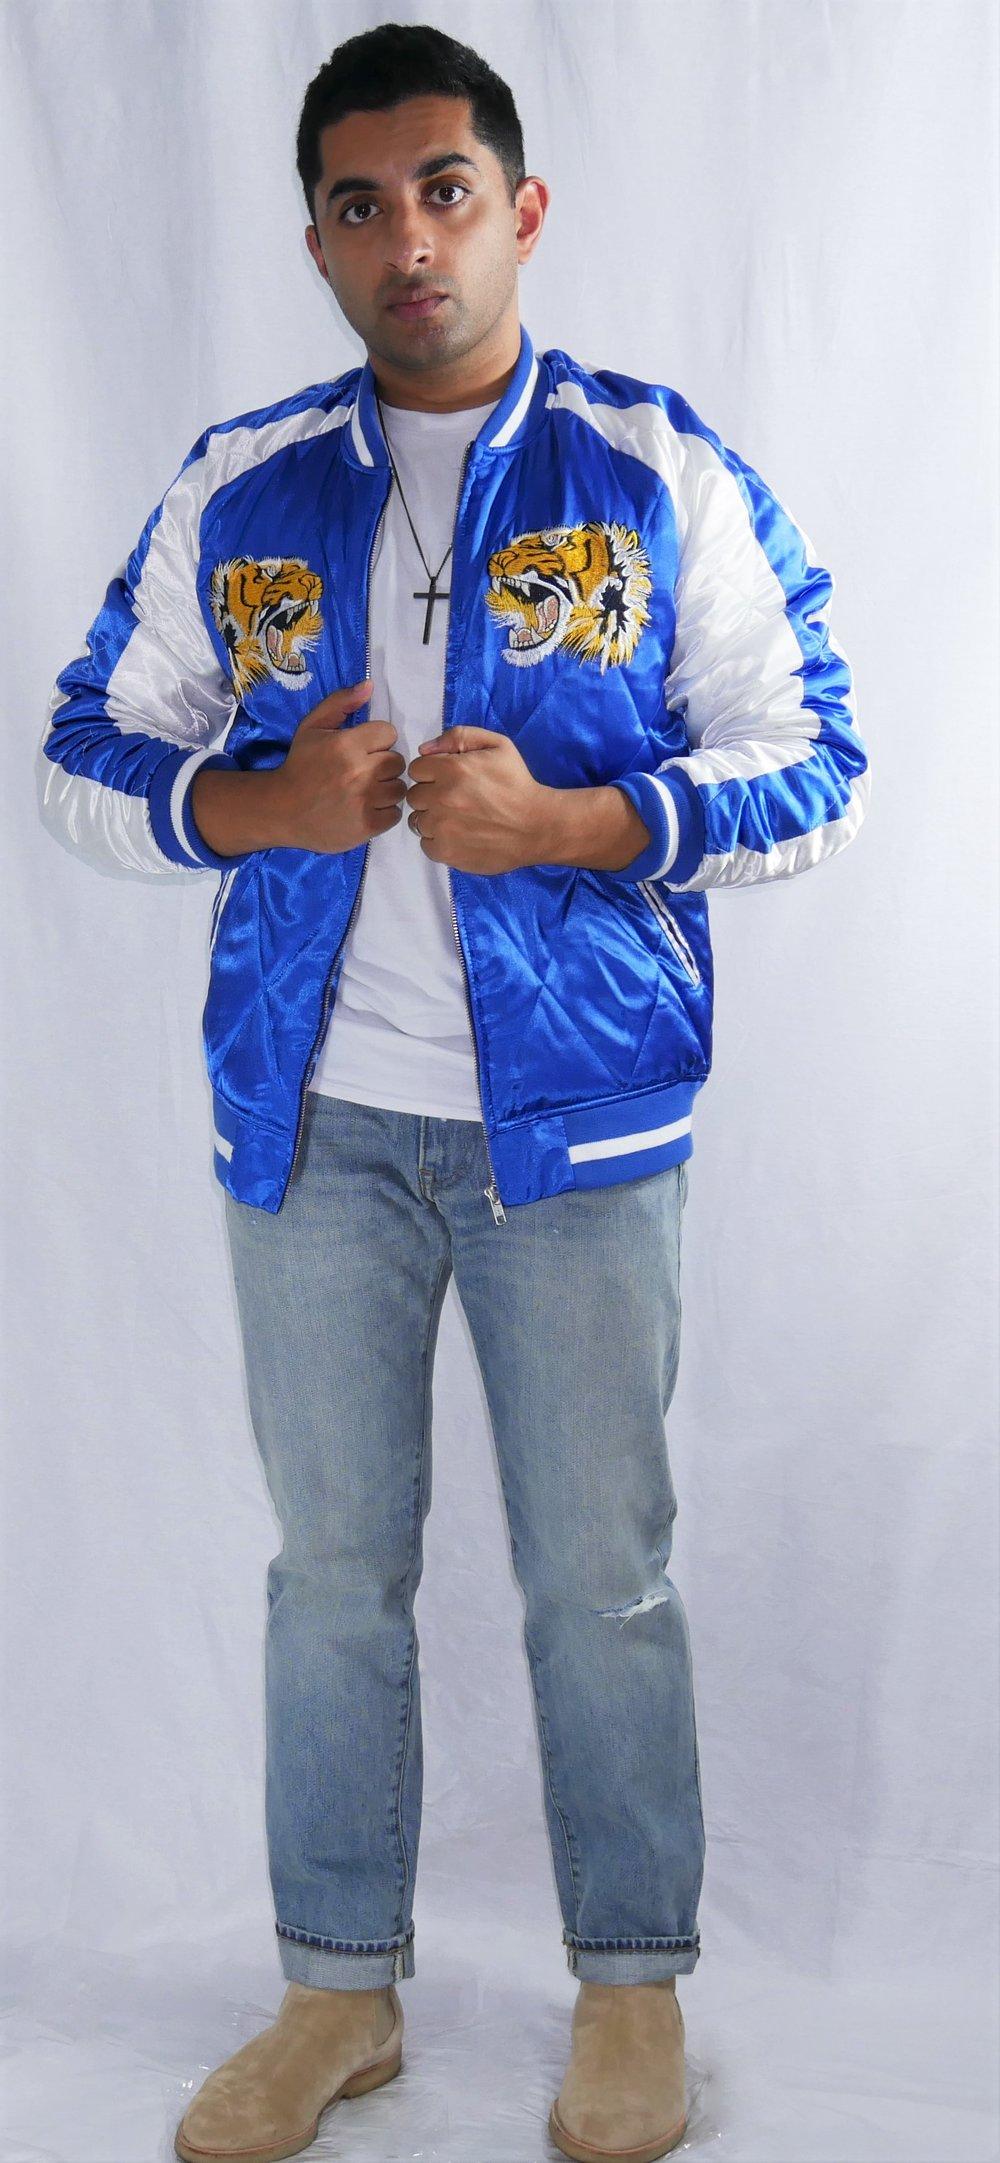 Jacket: Asos  T-shirt: Banana Republic  Jeans: J. Crew  Boots: Common Projects